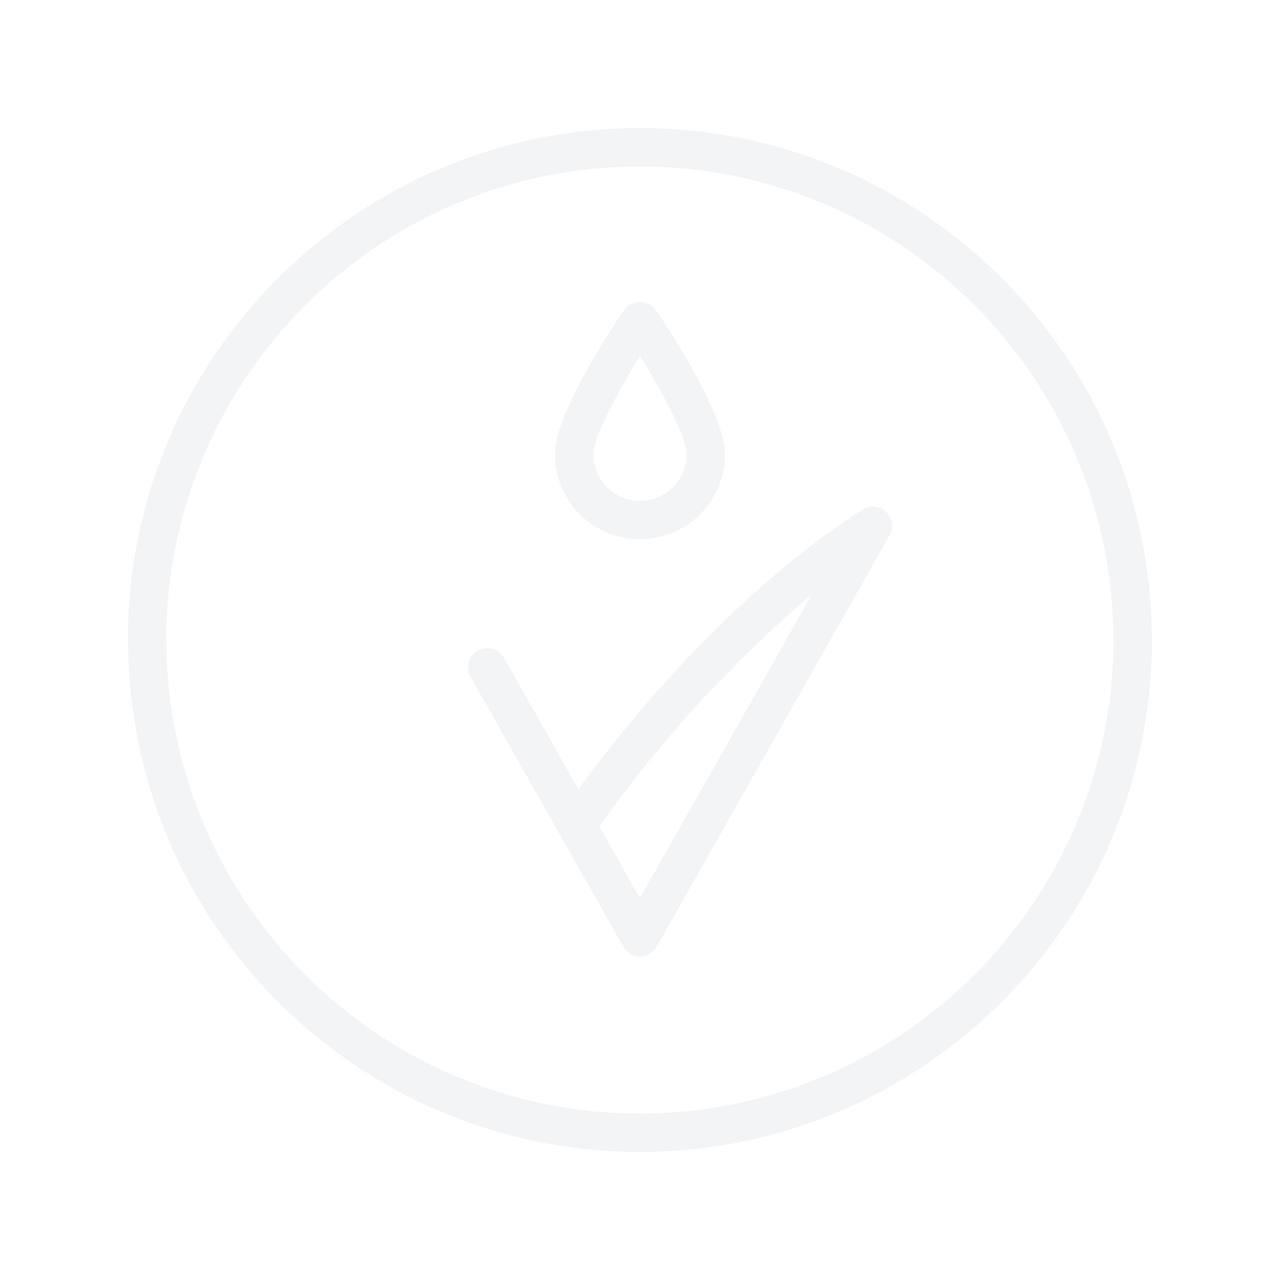 GIORGIO ARMANI Si 100ml Eau De Parfum Gift Set